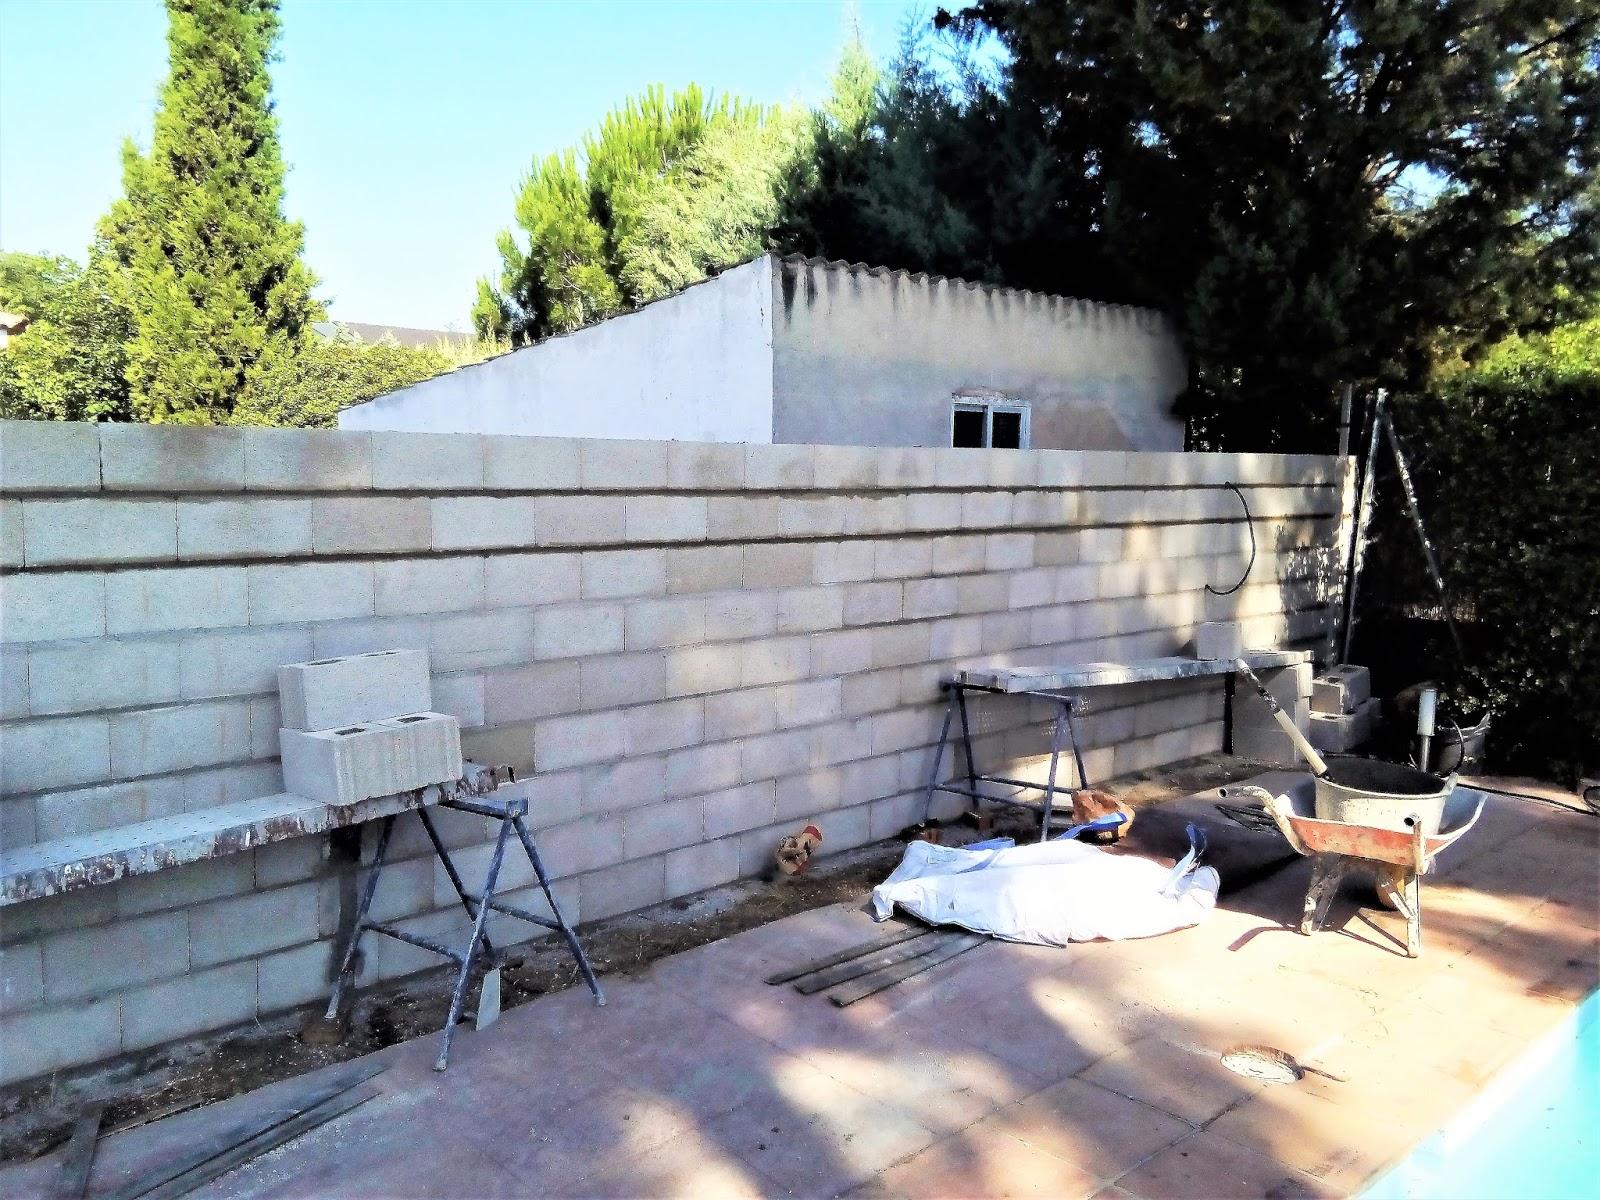 de muro con bloques de hormigon